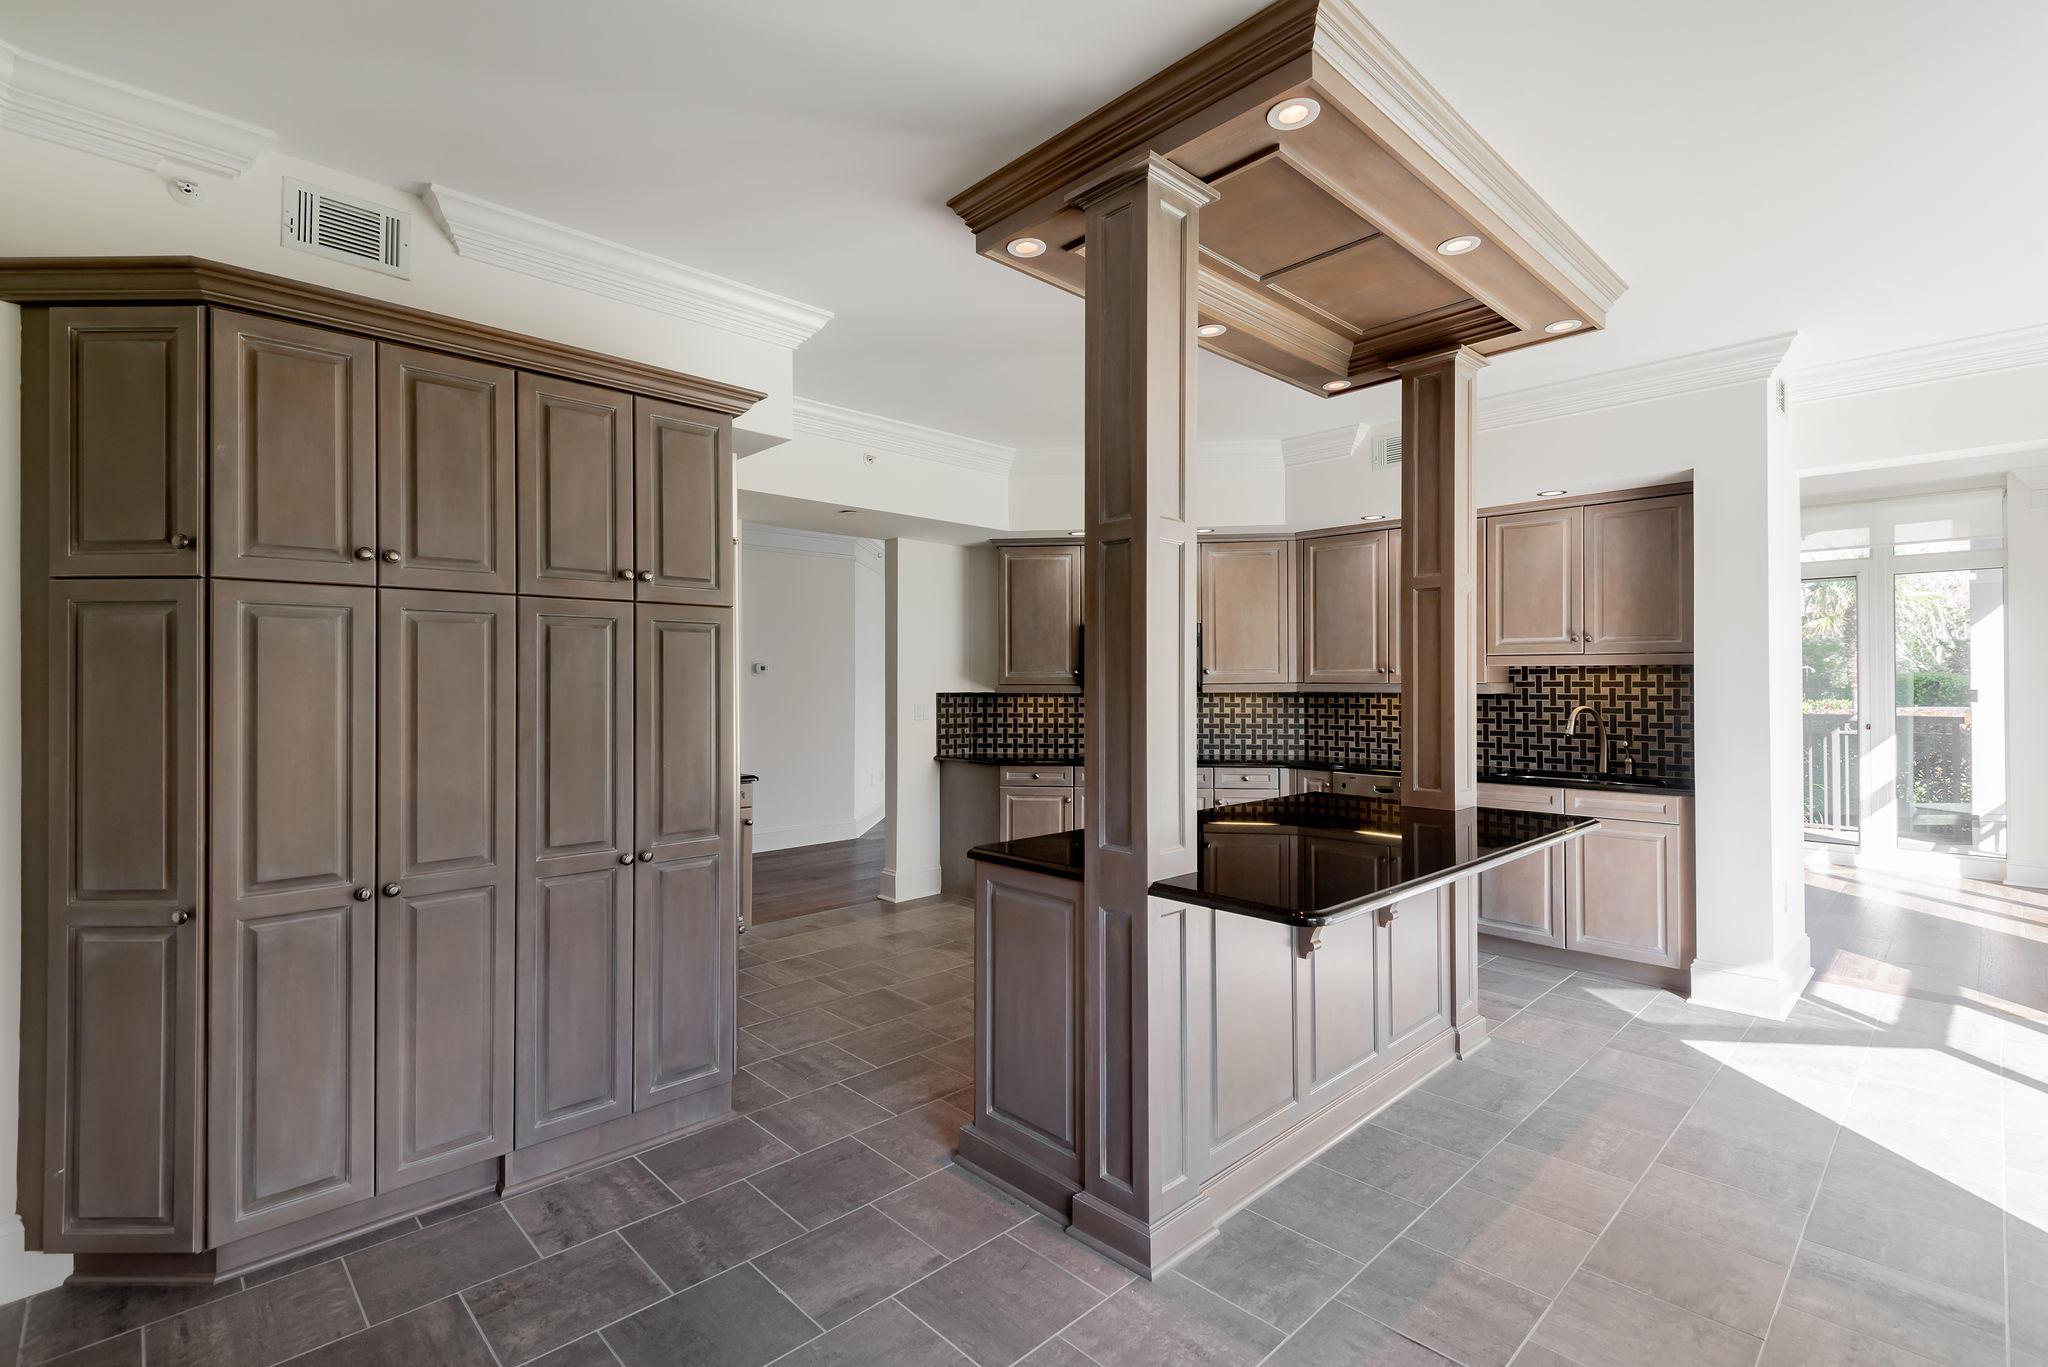 Renaissance On Chas Harbor Homes For Sale - 211 Plaza, Mount Pleasant, SC - 26